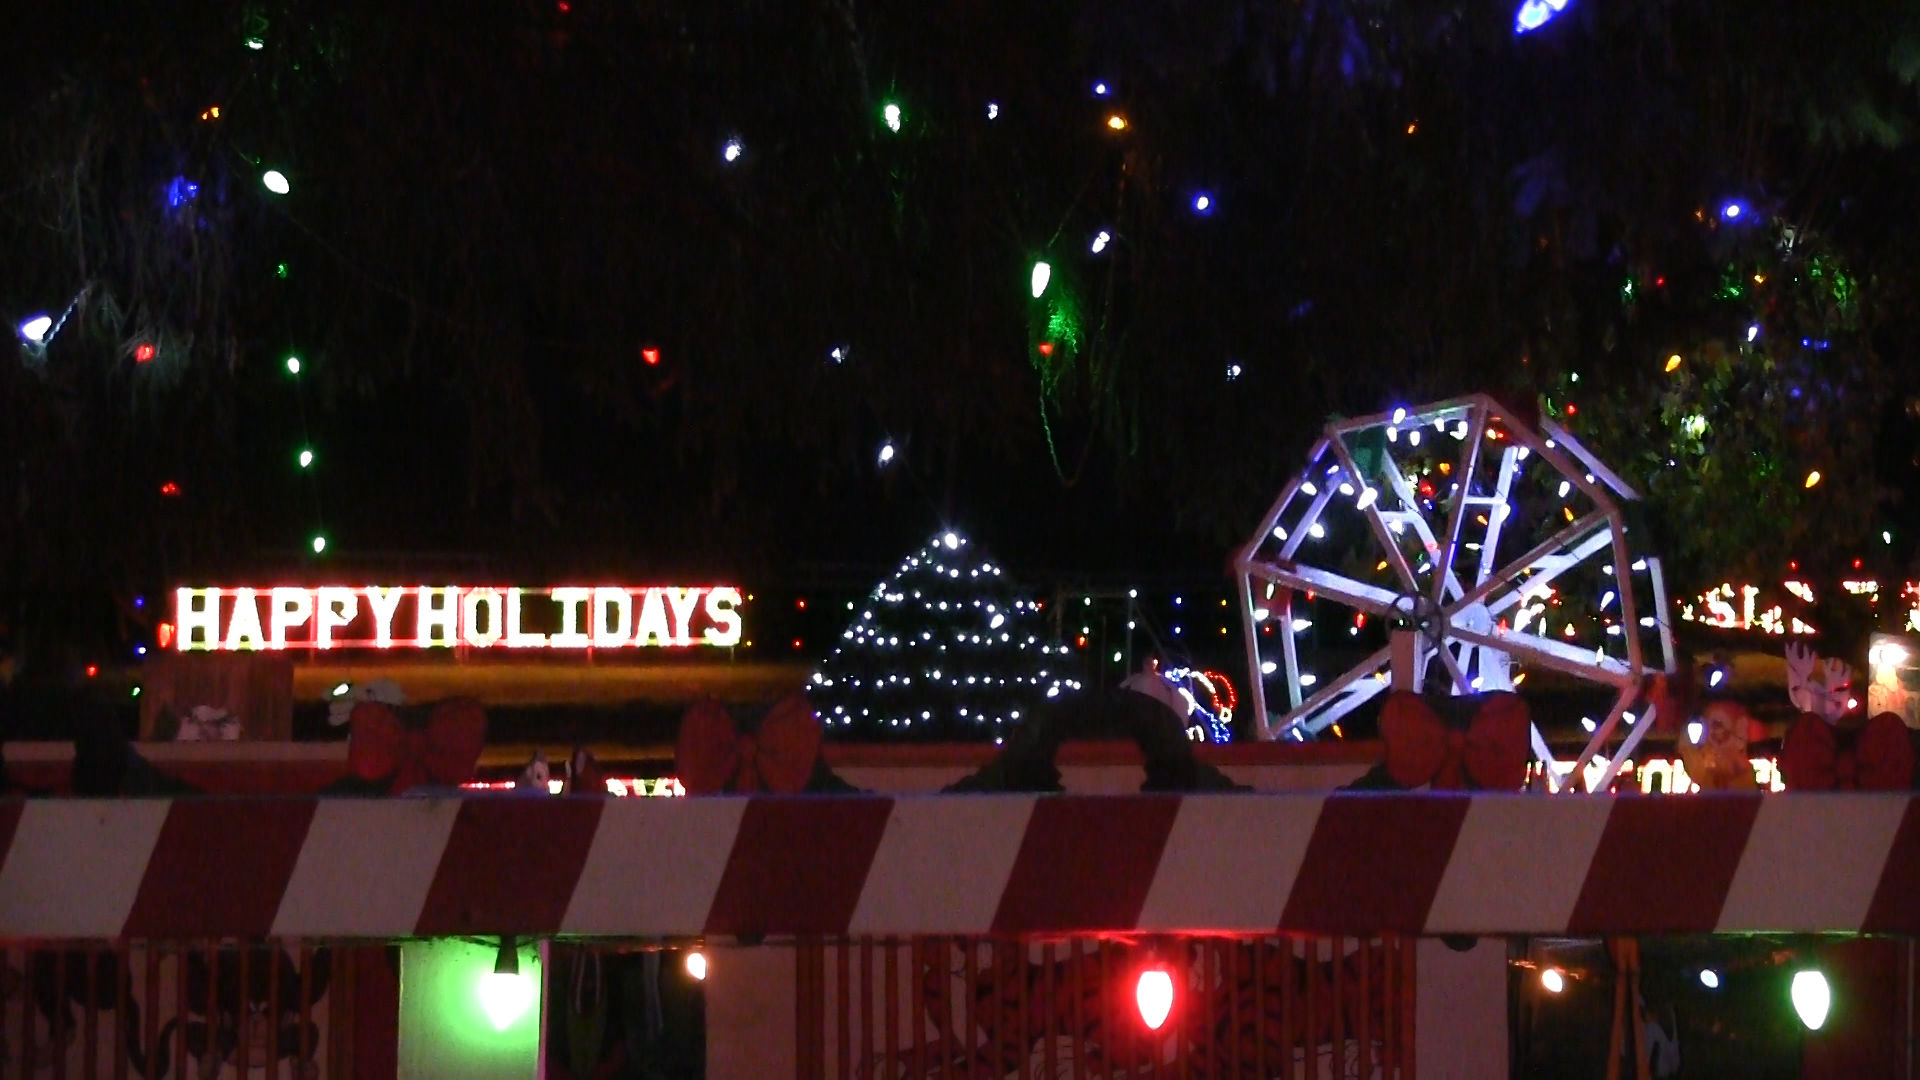 With 1 million lights, Koziar's Christmas Village in Berks County ...